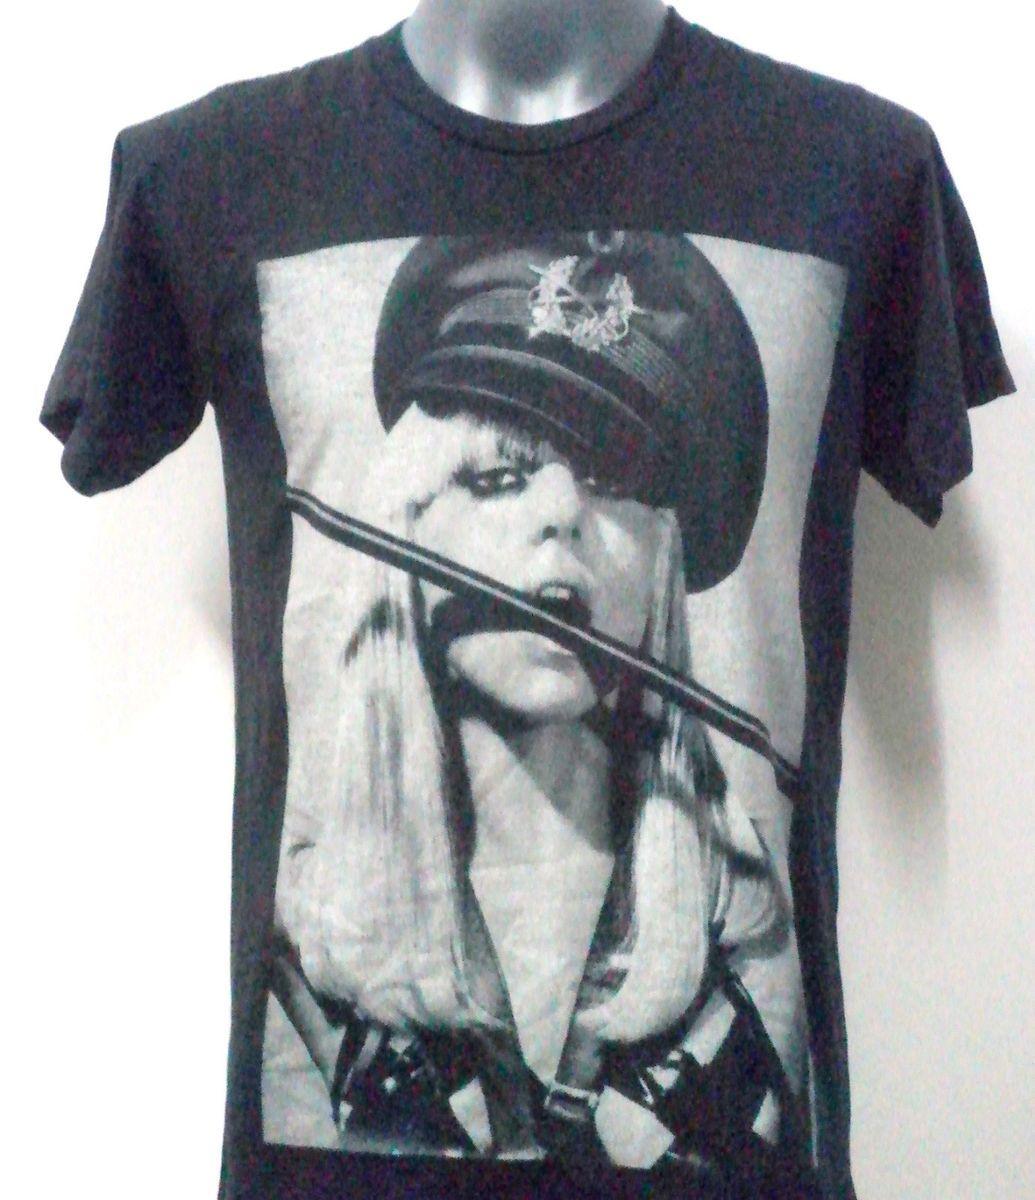 Lady Gaga Pop Rock T Shirt Black Size M